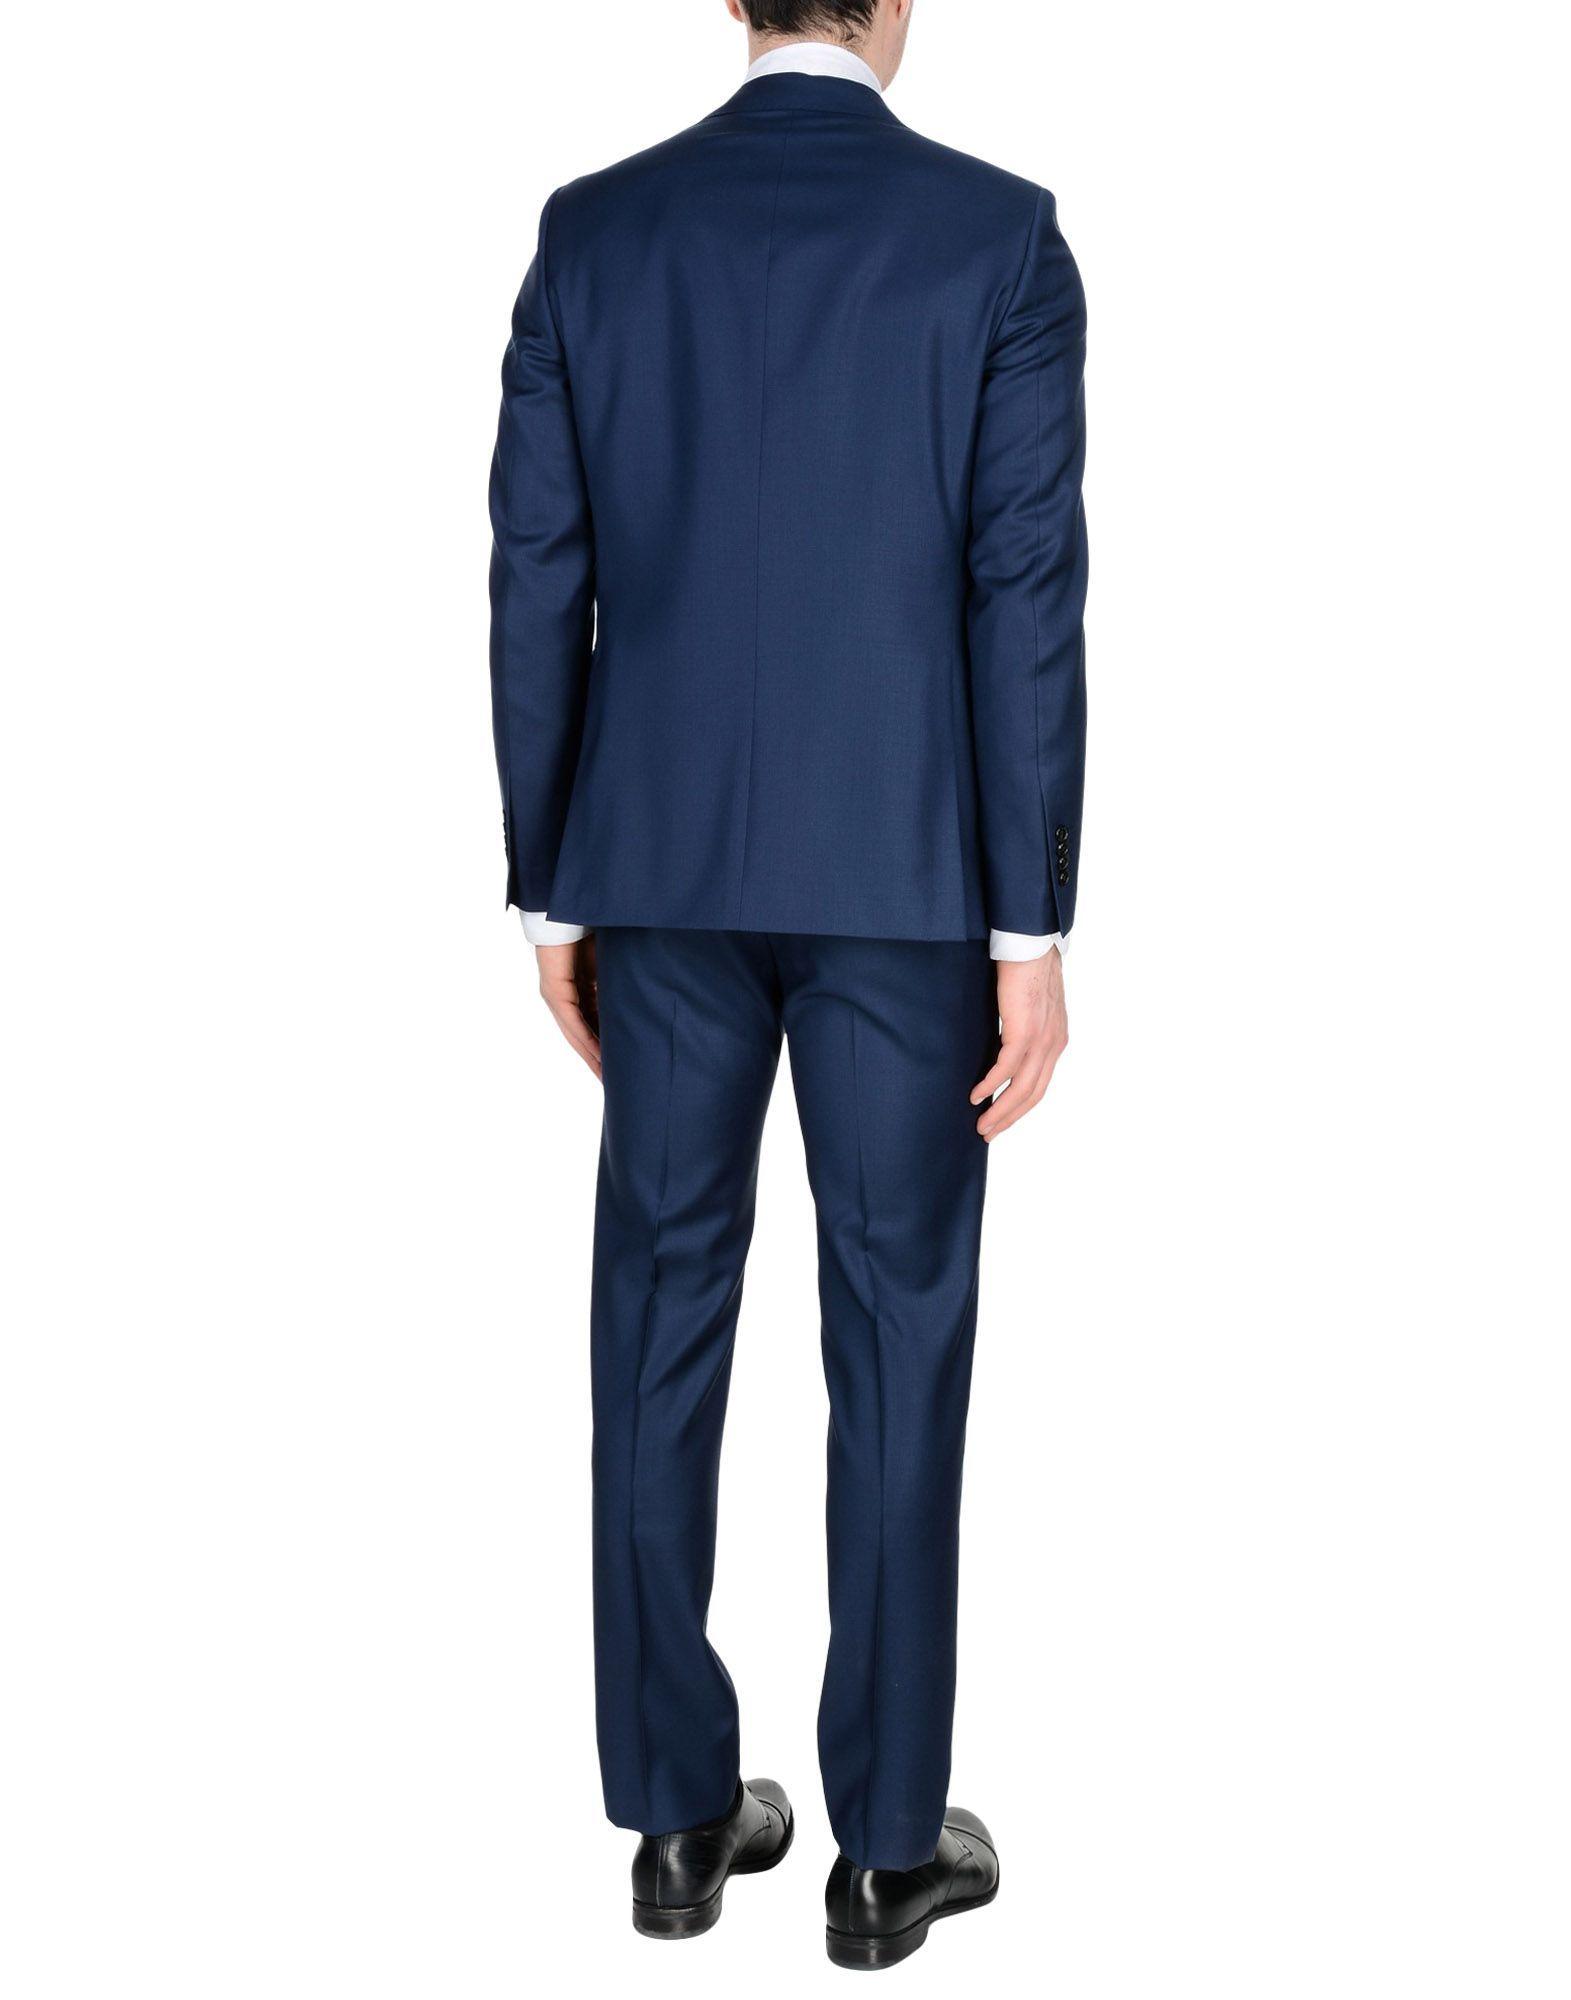 Tombolini Blue Virgin Wool Suit